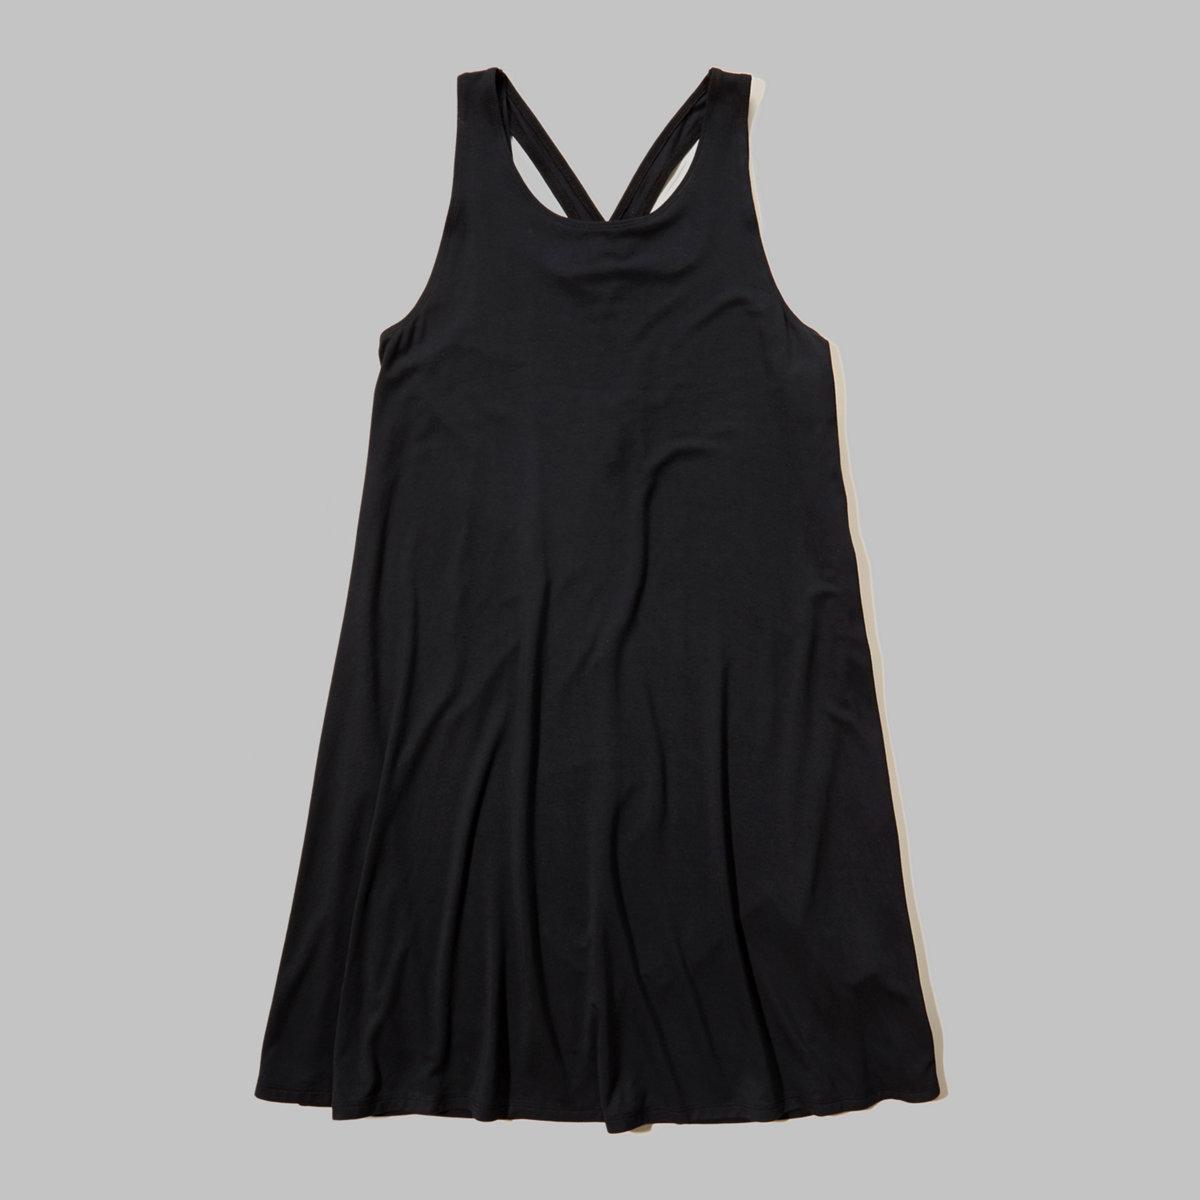 Must-Have Knit Swing Dress